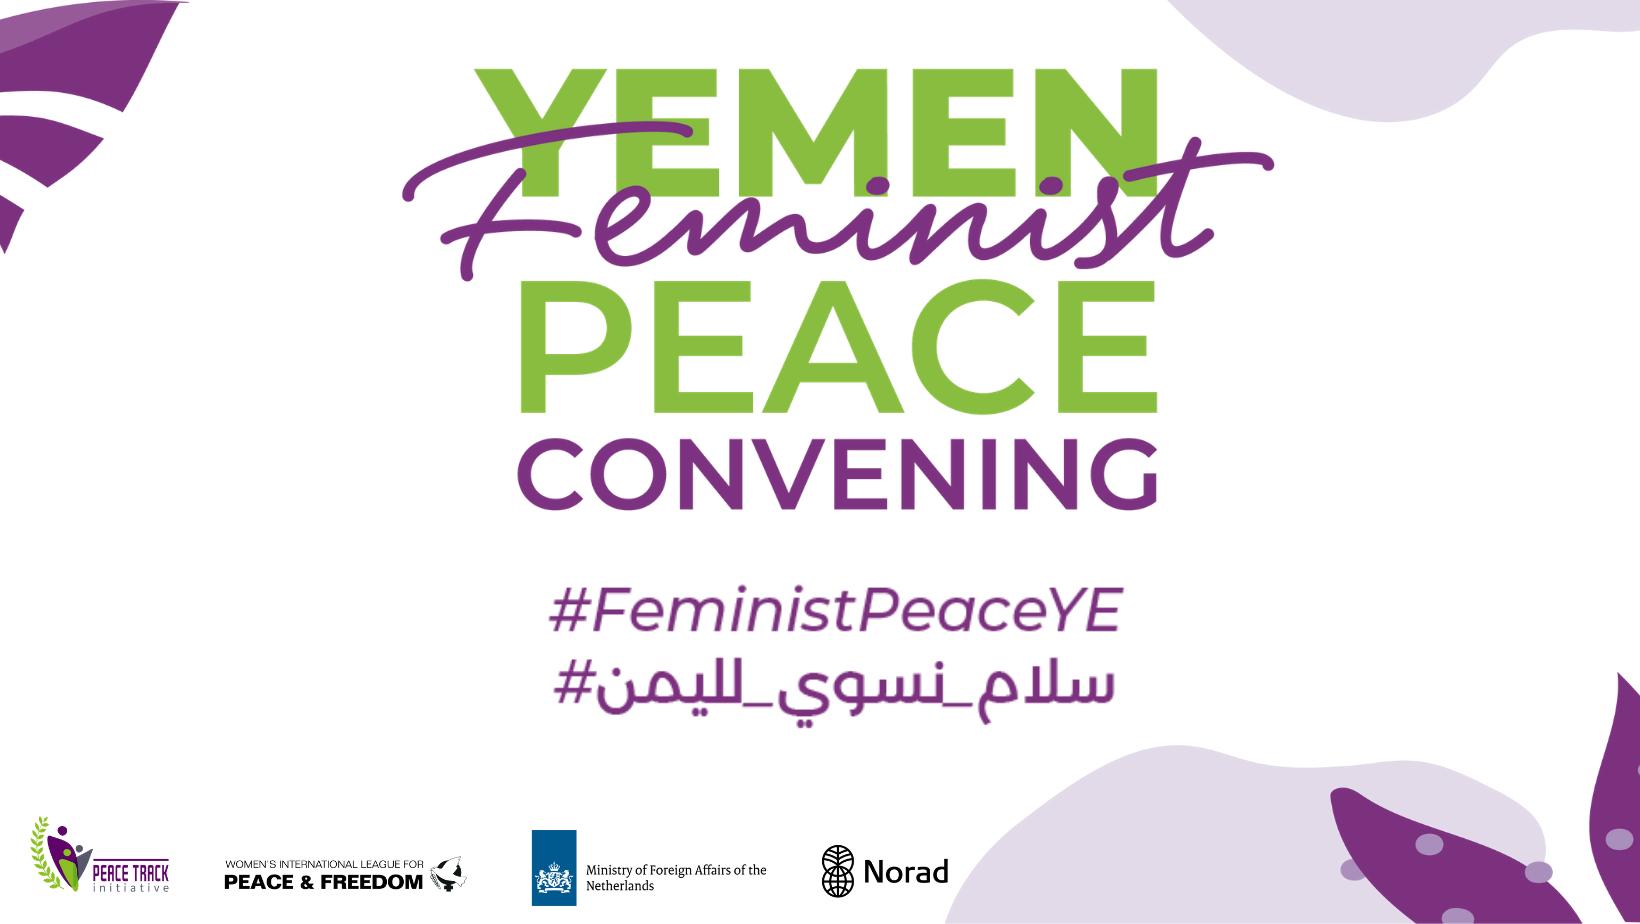 Yemen Feminist Peace Convening